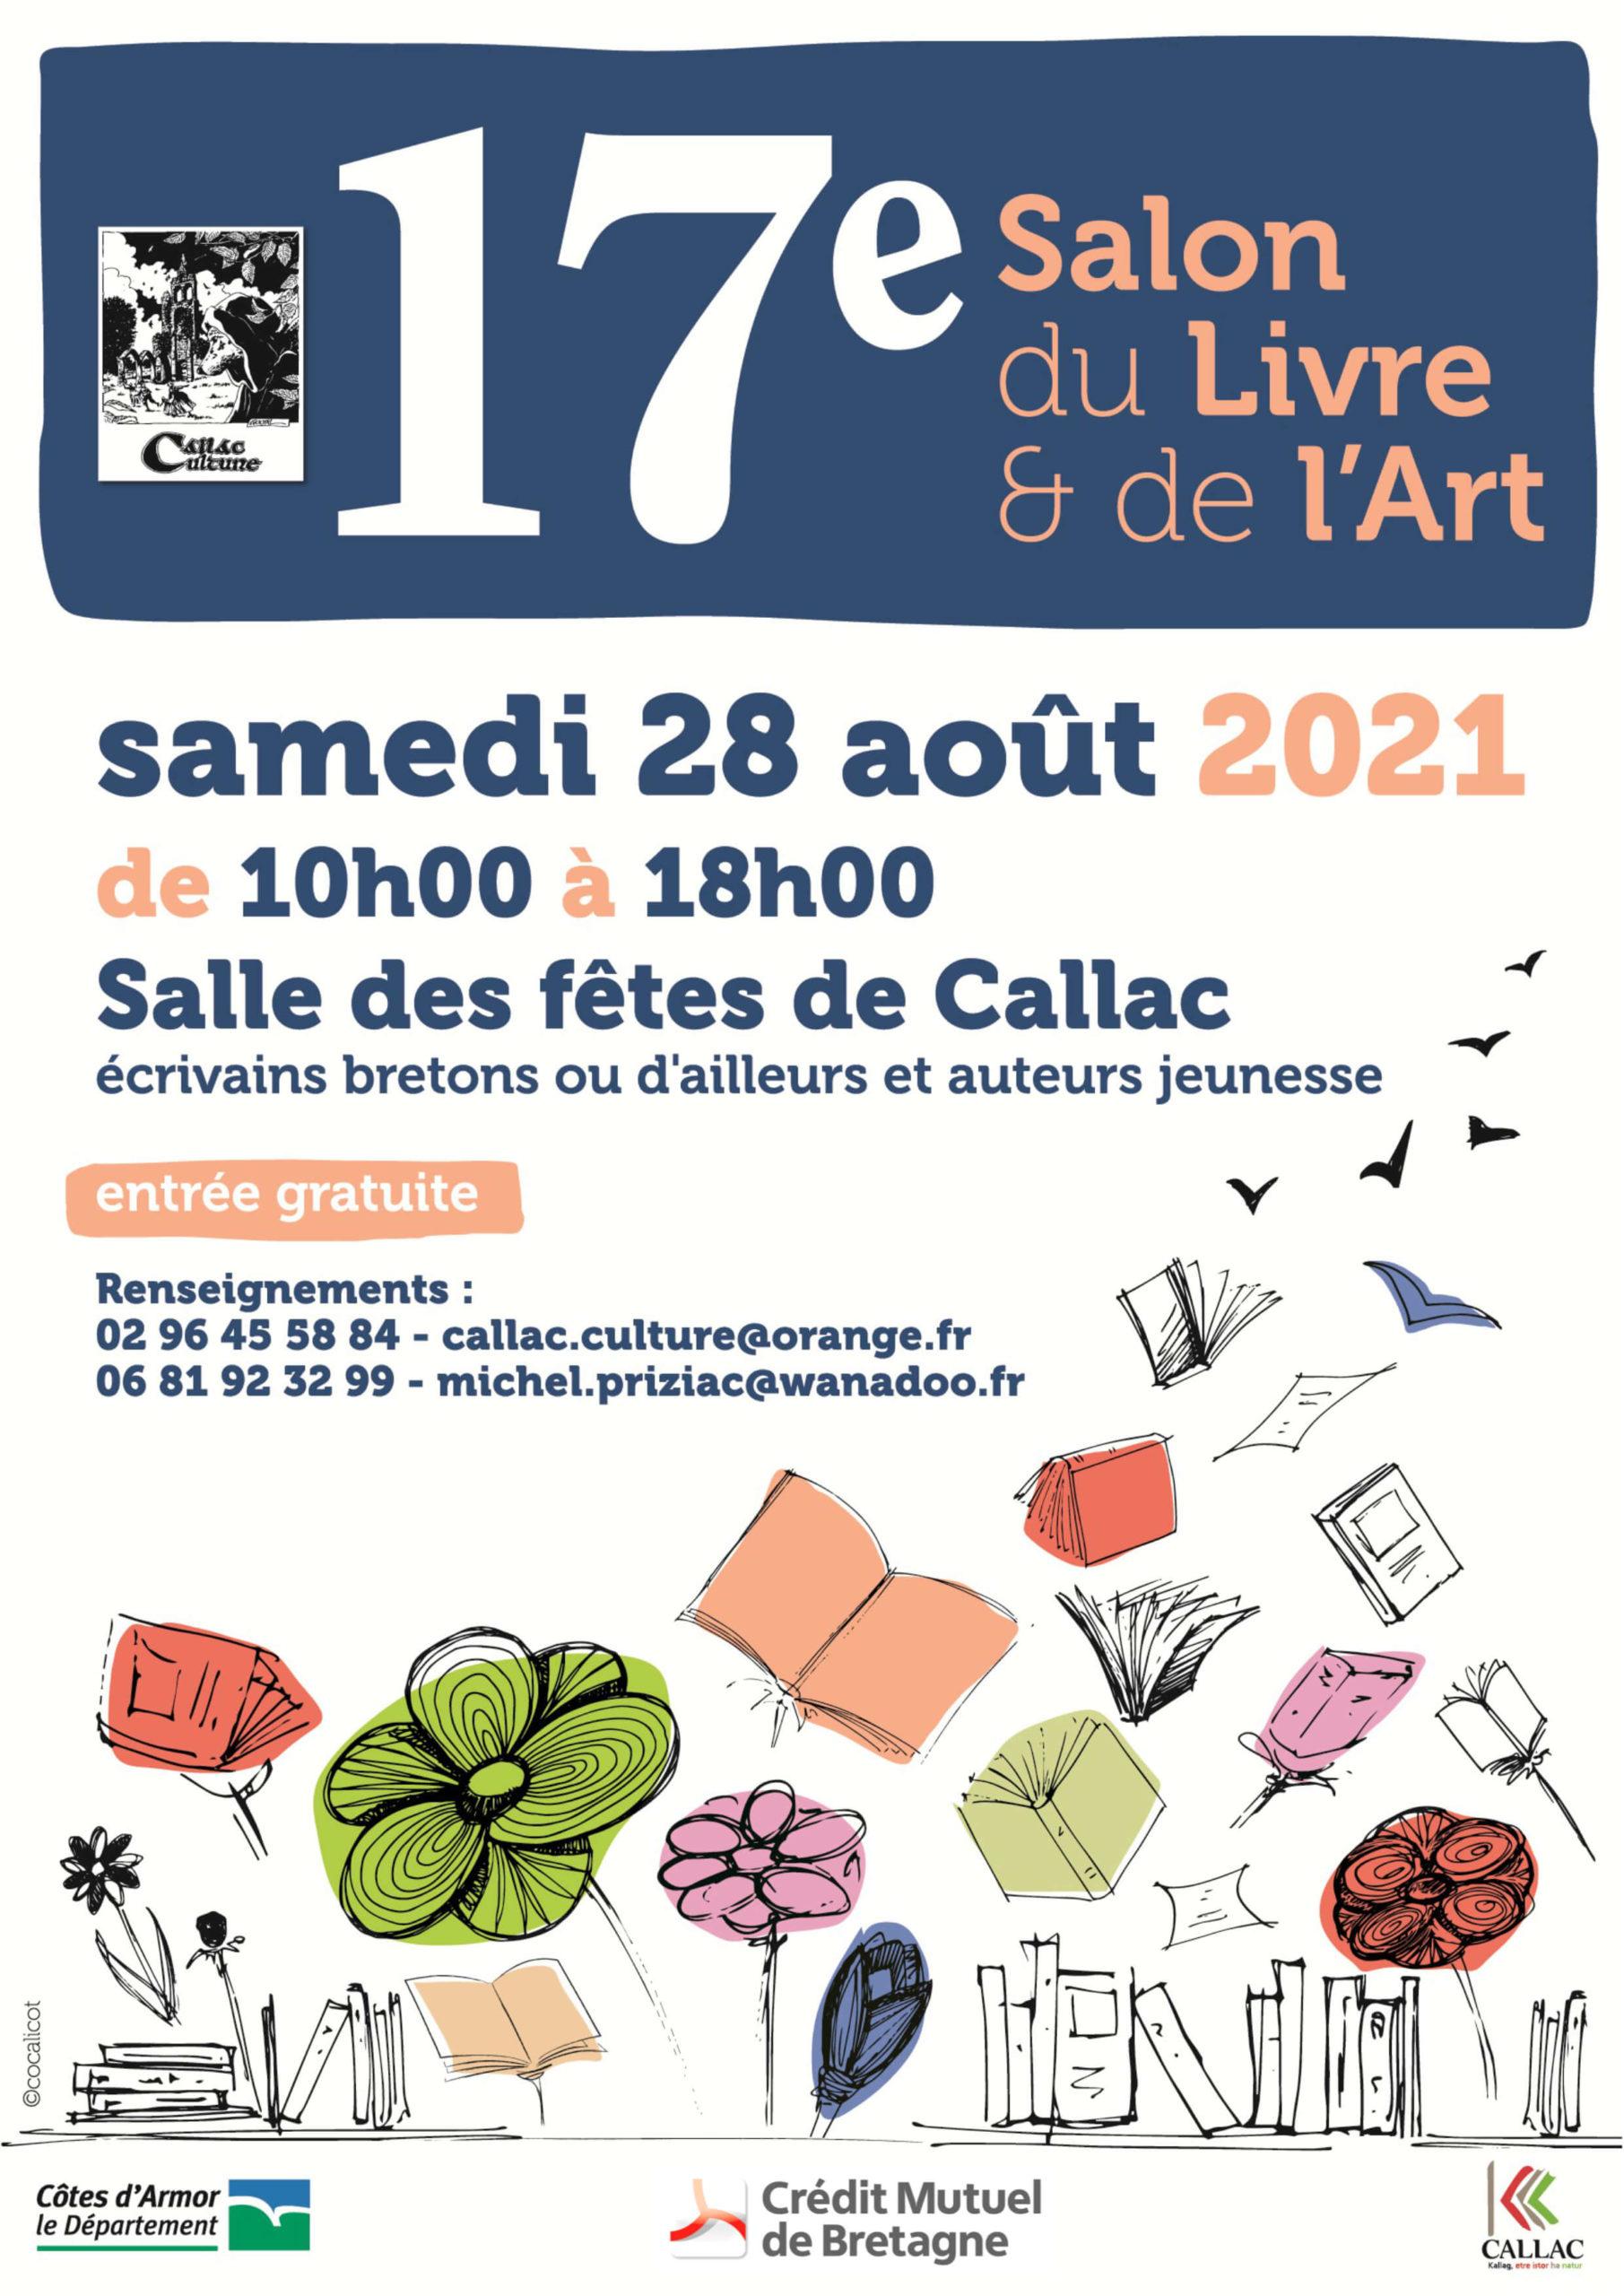 17eme-Salon-du-Livre-21